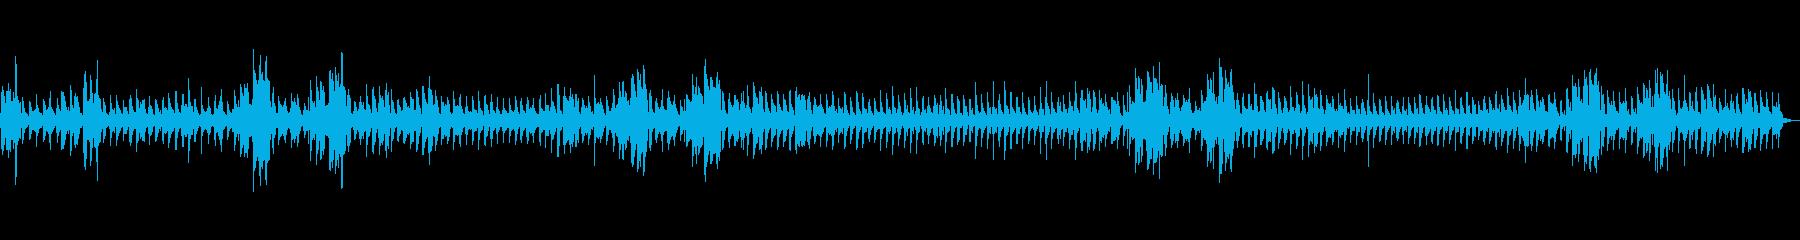 APACHE CEREMONIAL...の再生済みの波形